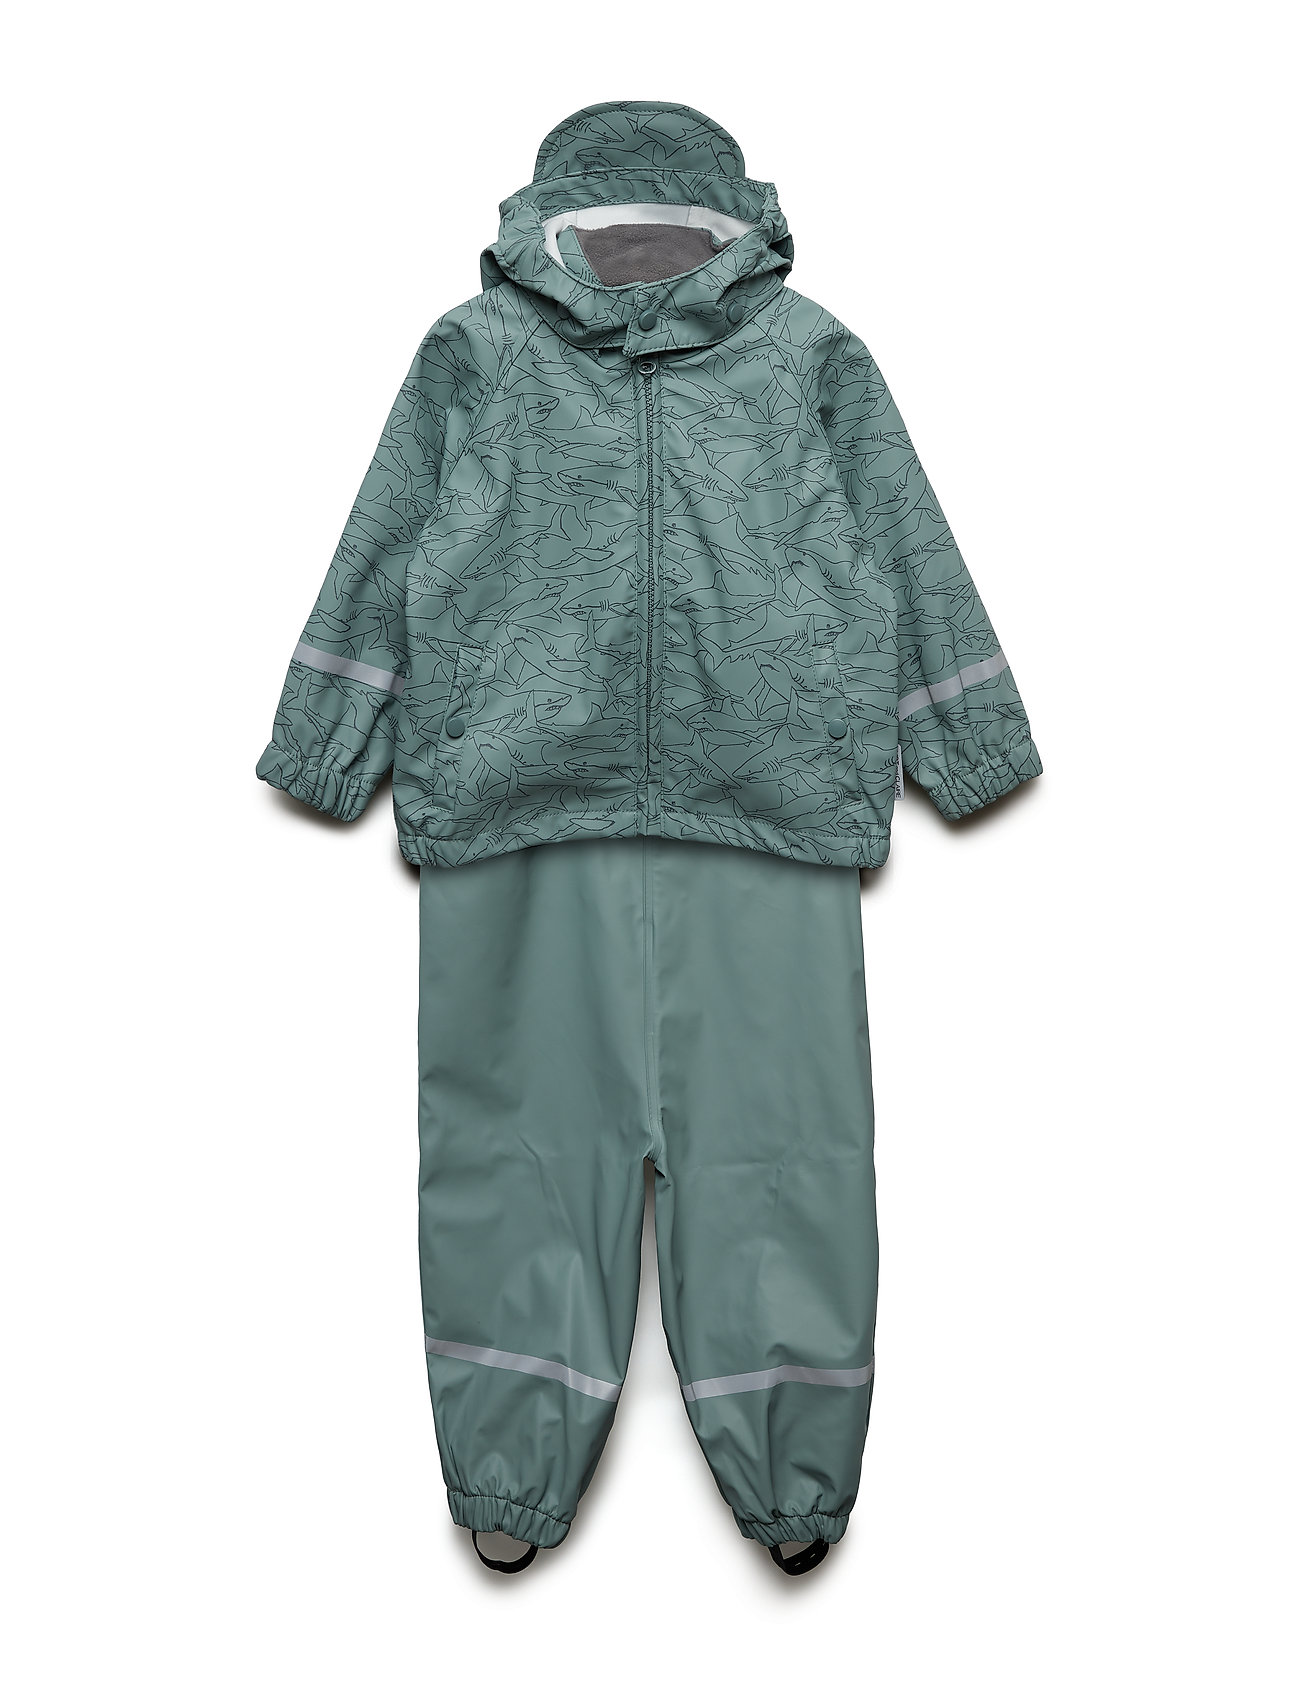 Hust & Claire Olmo - Rainwear